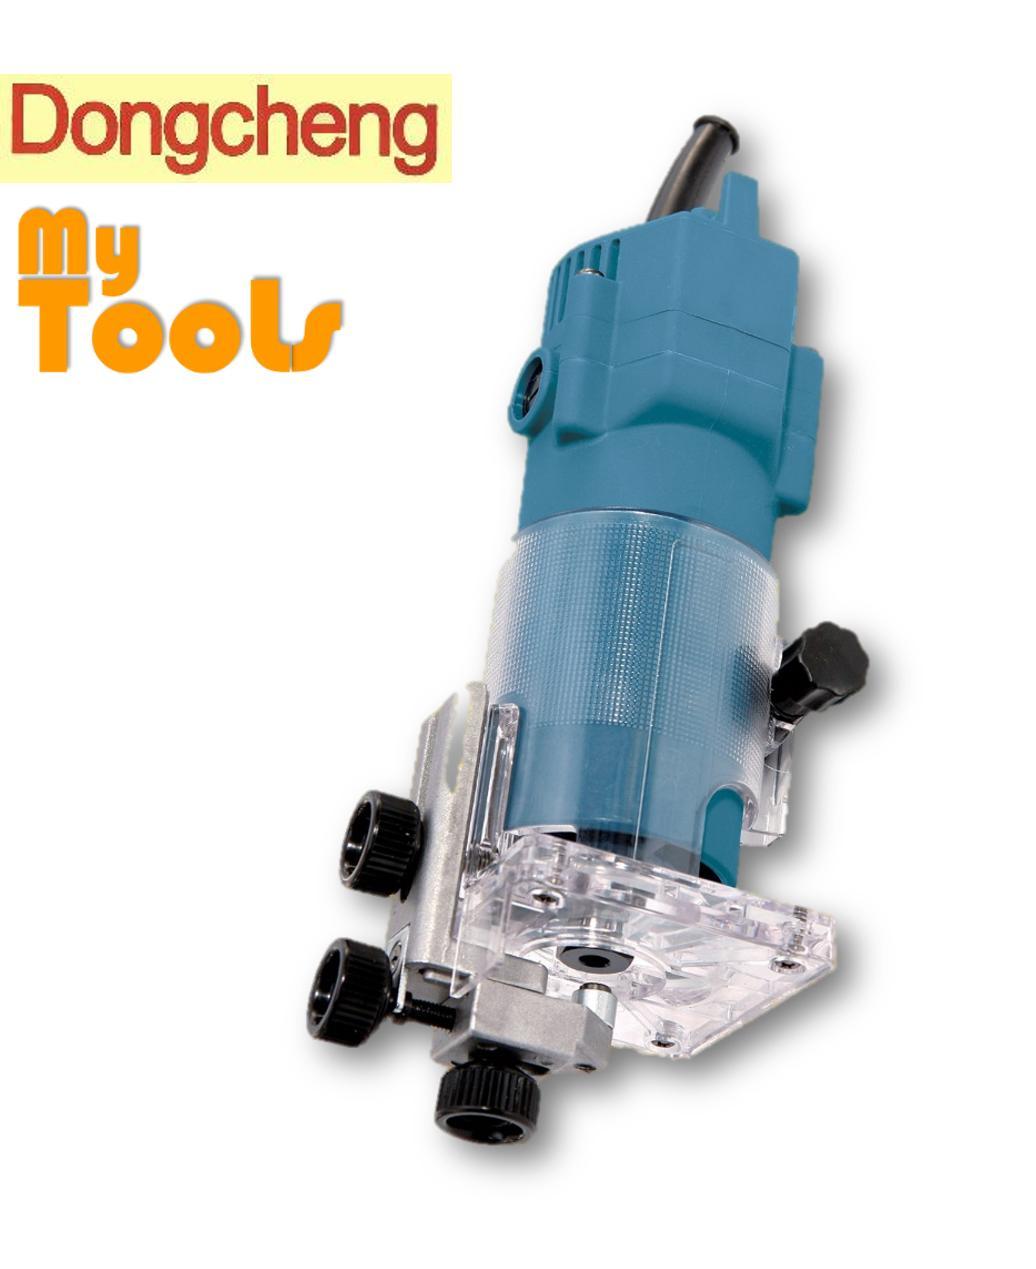 DongCheng DMP02-6 Wood Trimmer 6.35mm (6 Month Warranty)